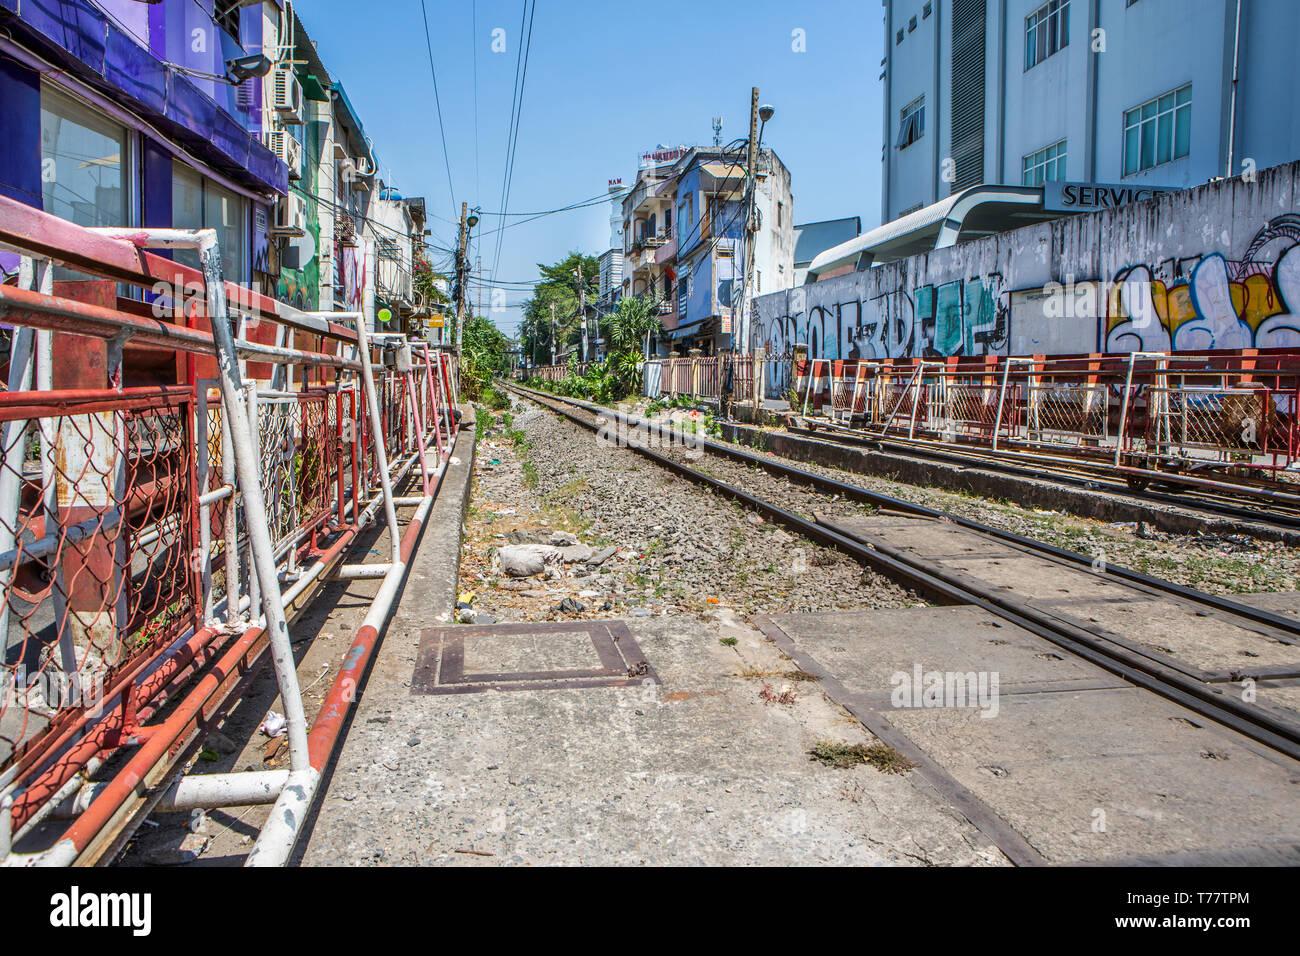 Railway lines in Ho Chi Minh City, Vietnam. - Stock Image